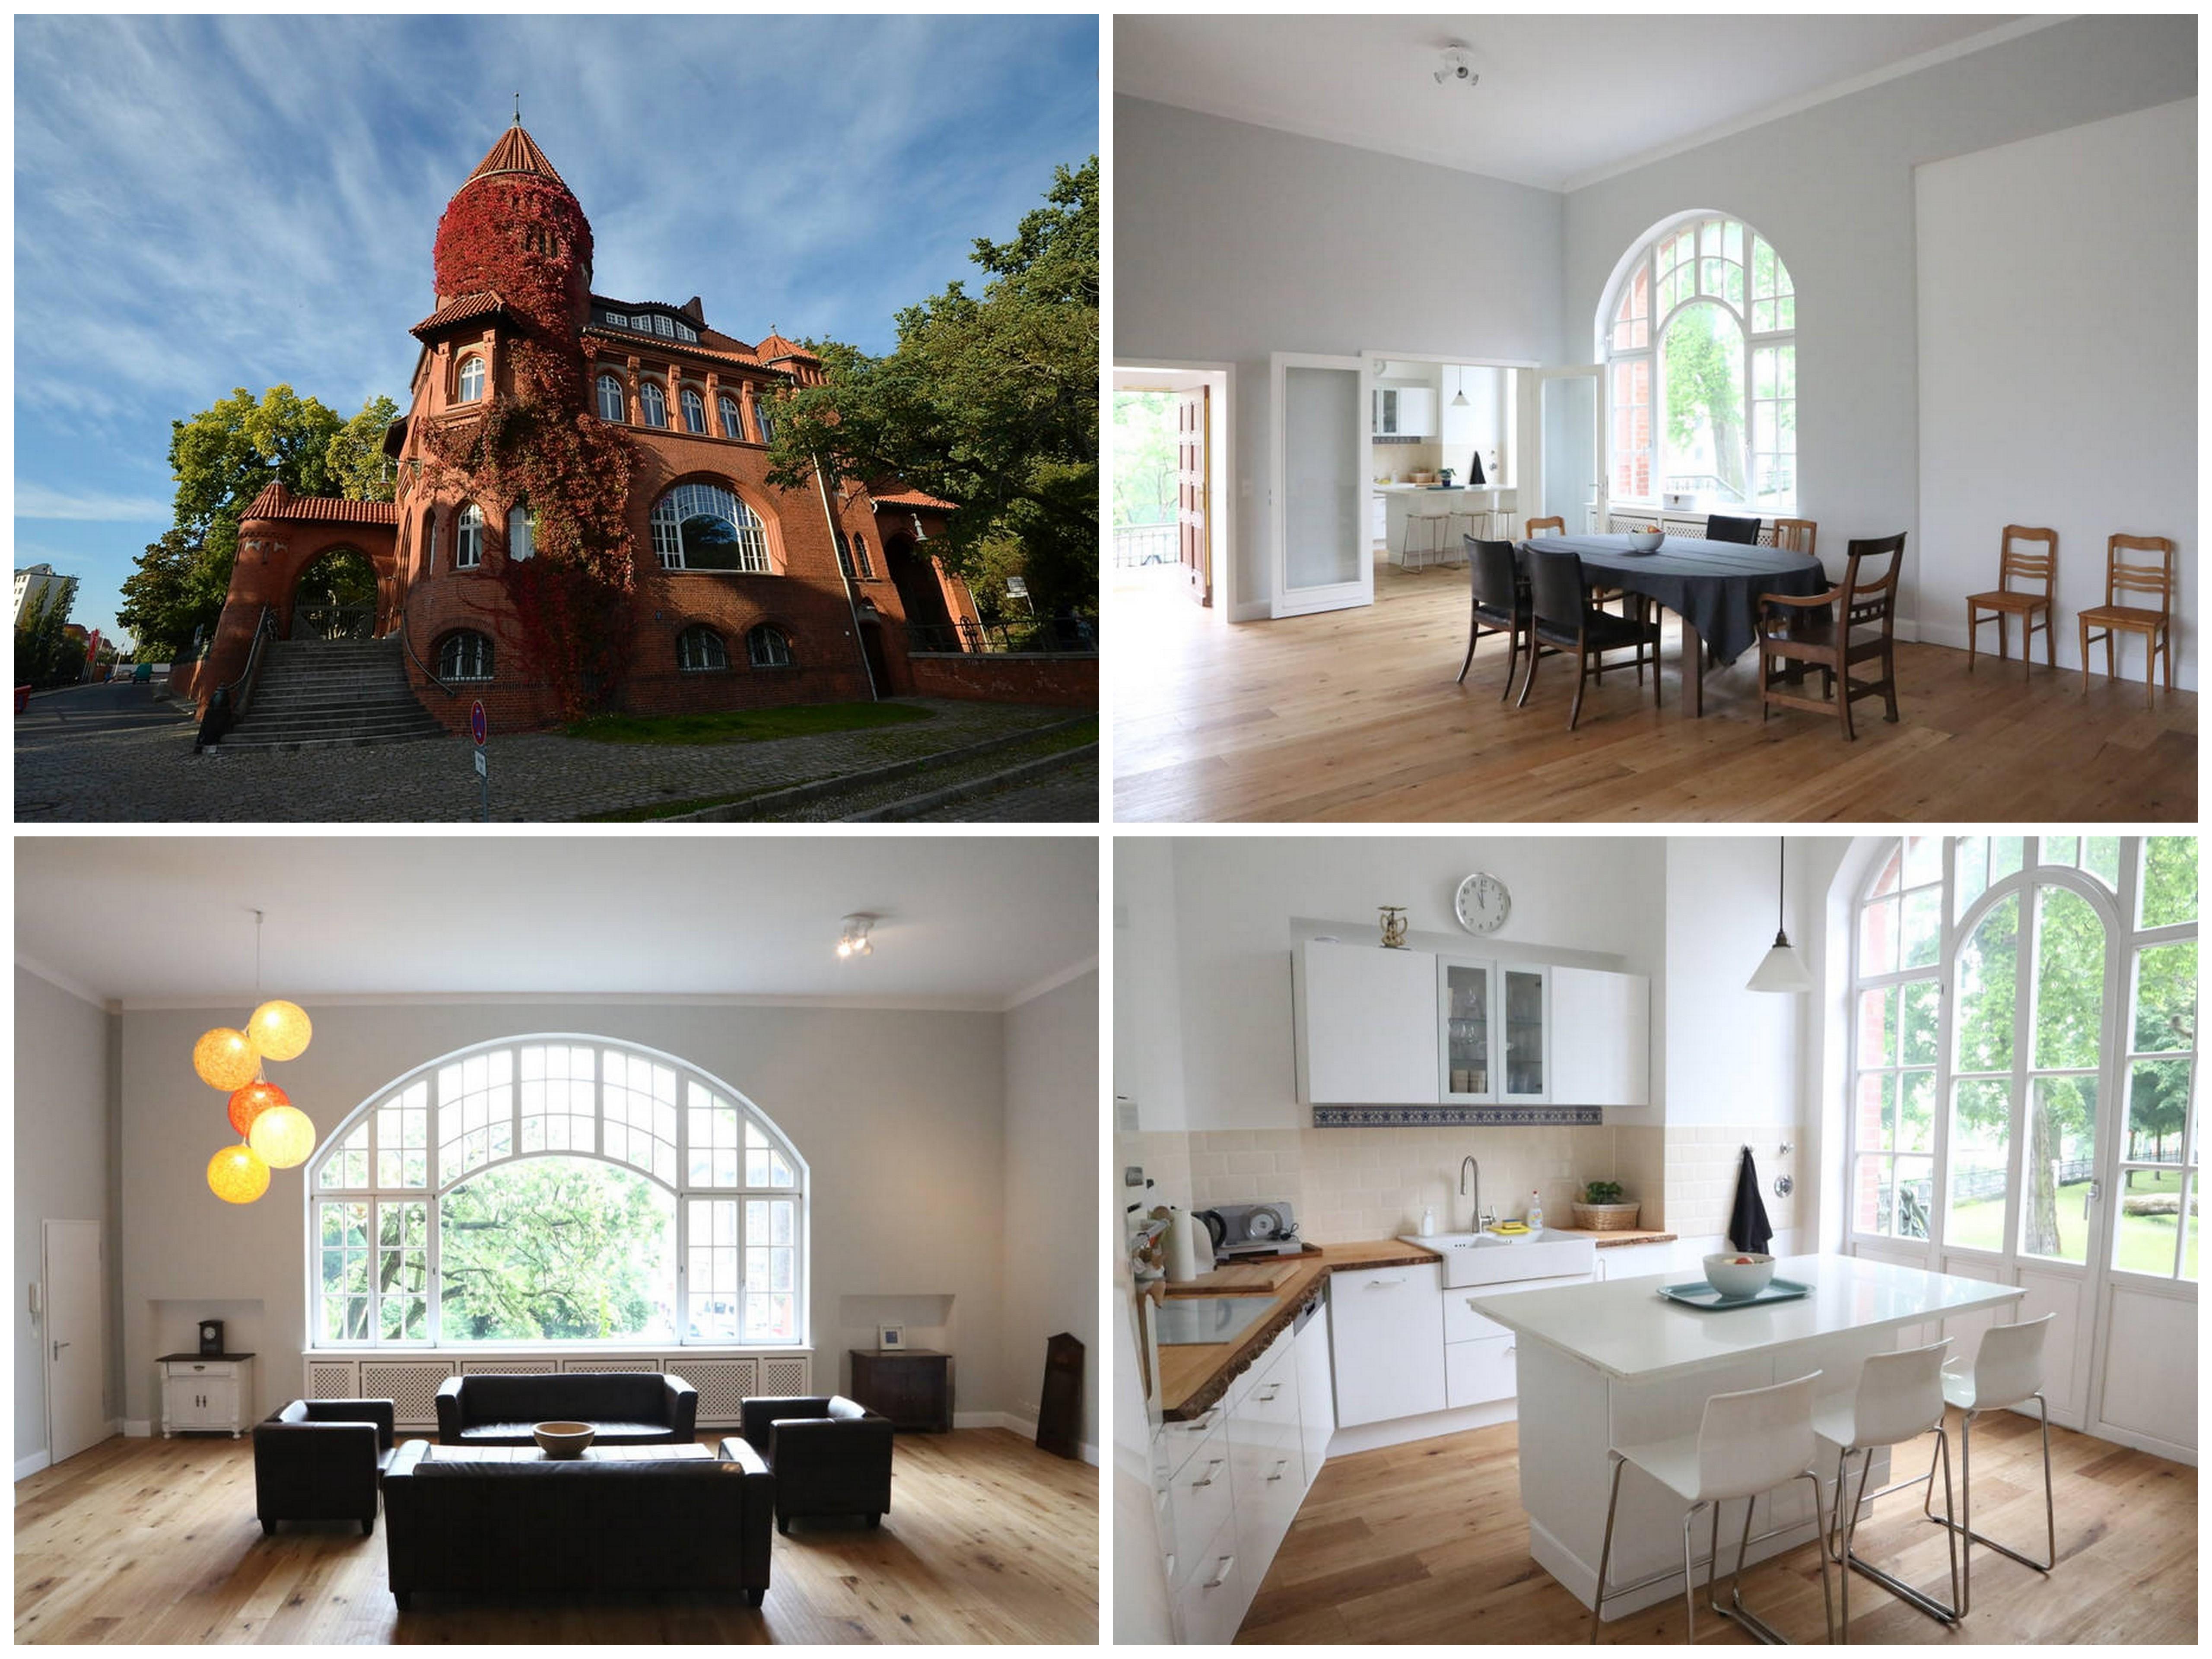 Аренда жилья через Airbnb